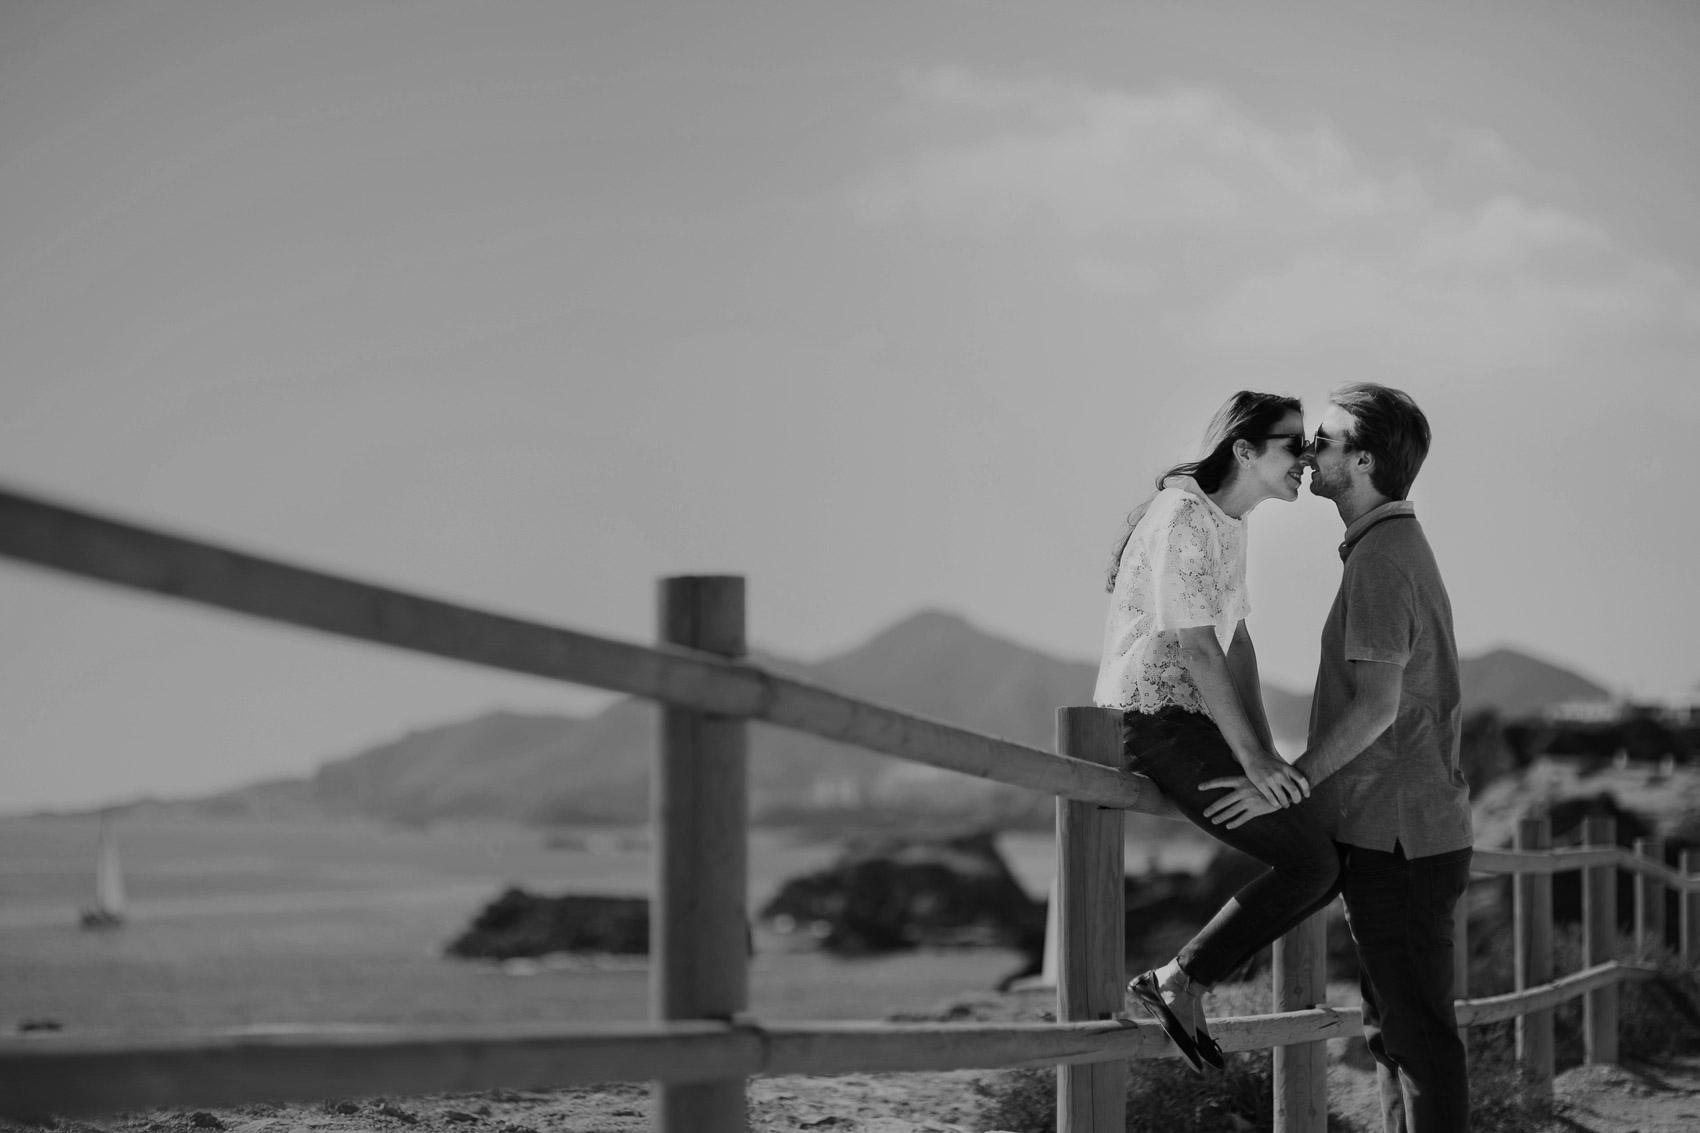 pareja beso valla madera playa